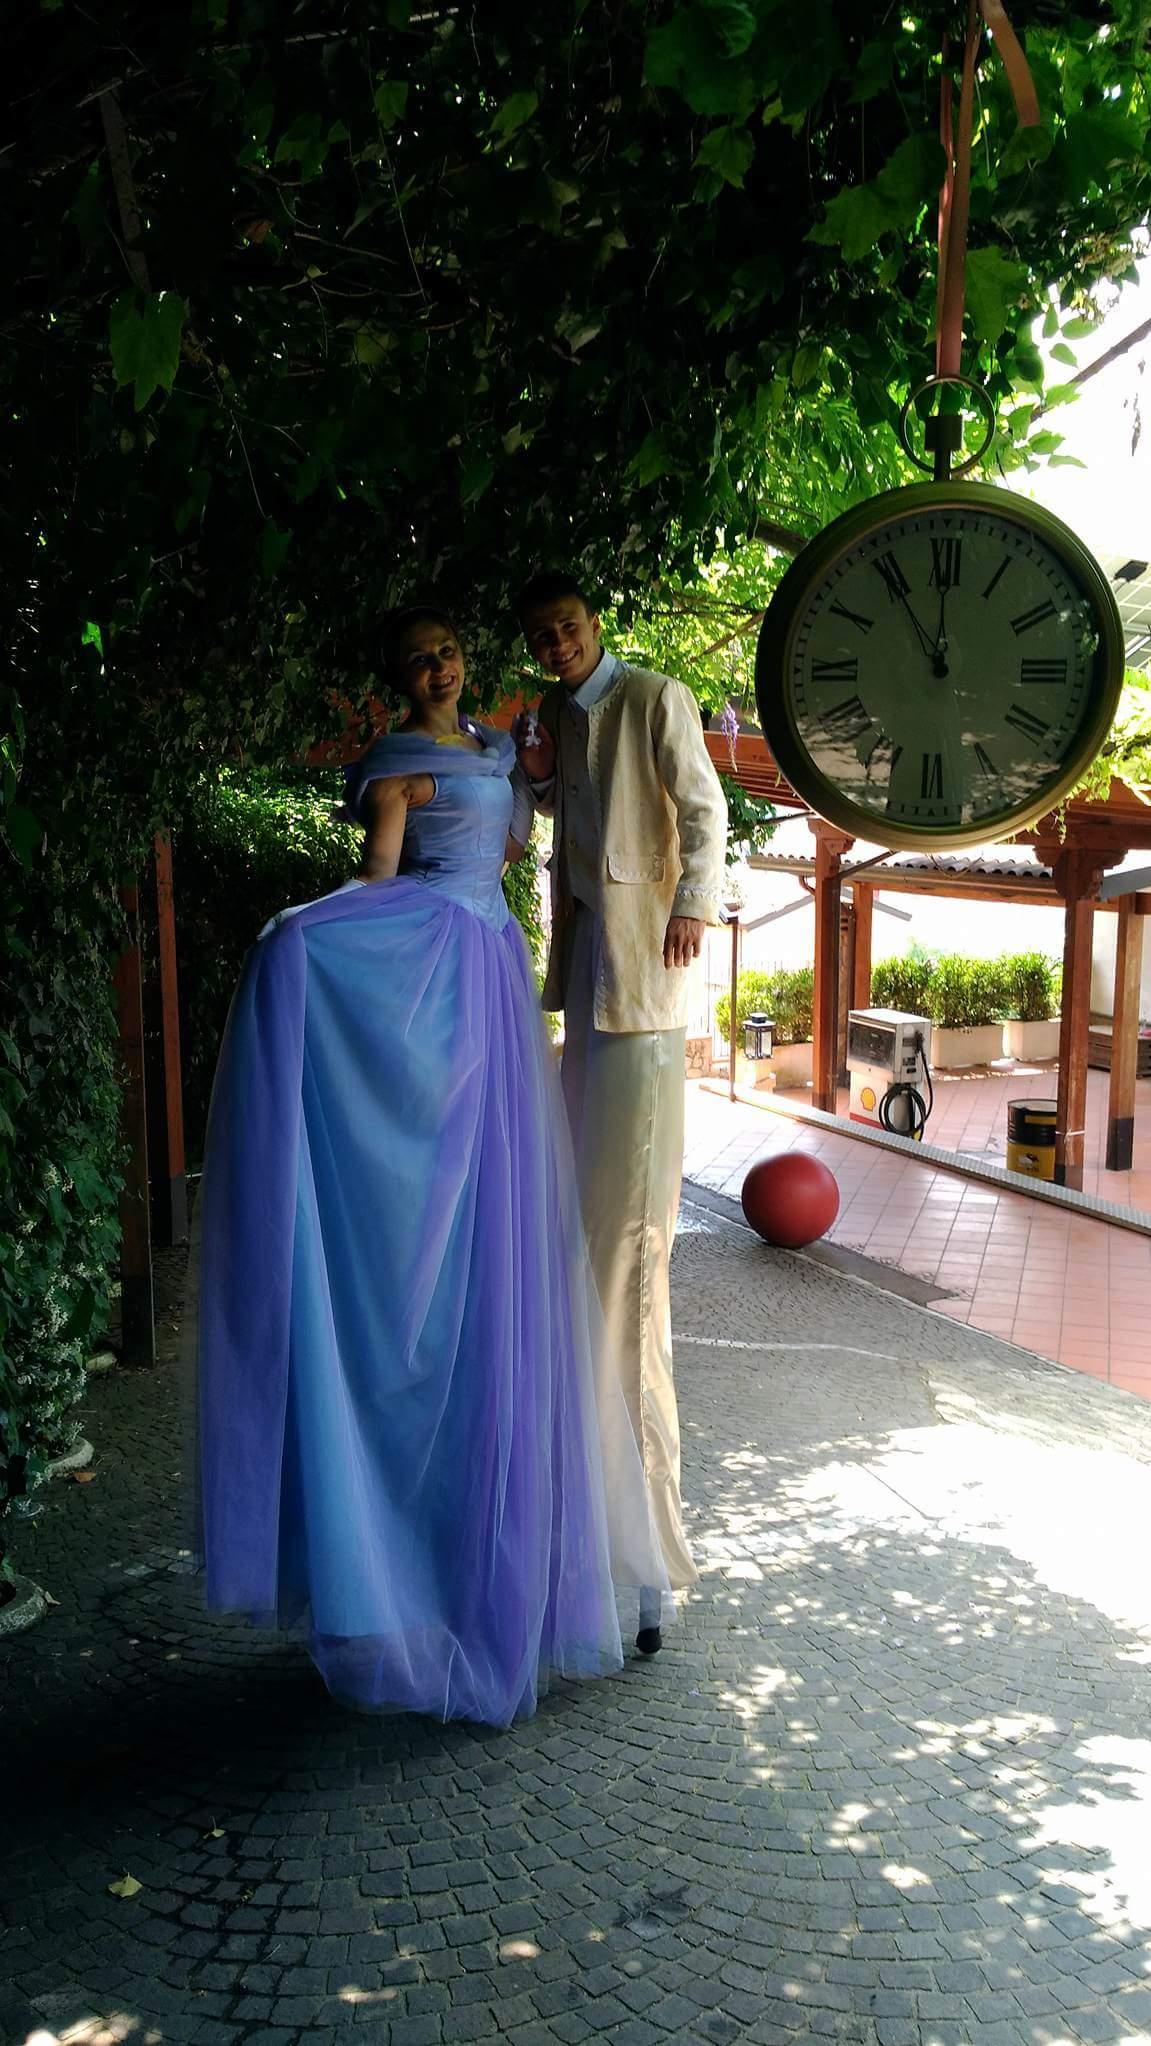 trampolieri_principessa_principe_1